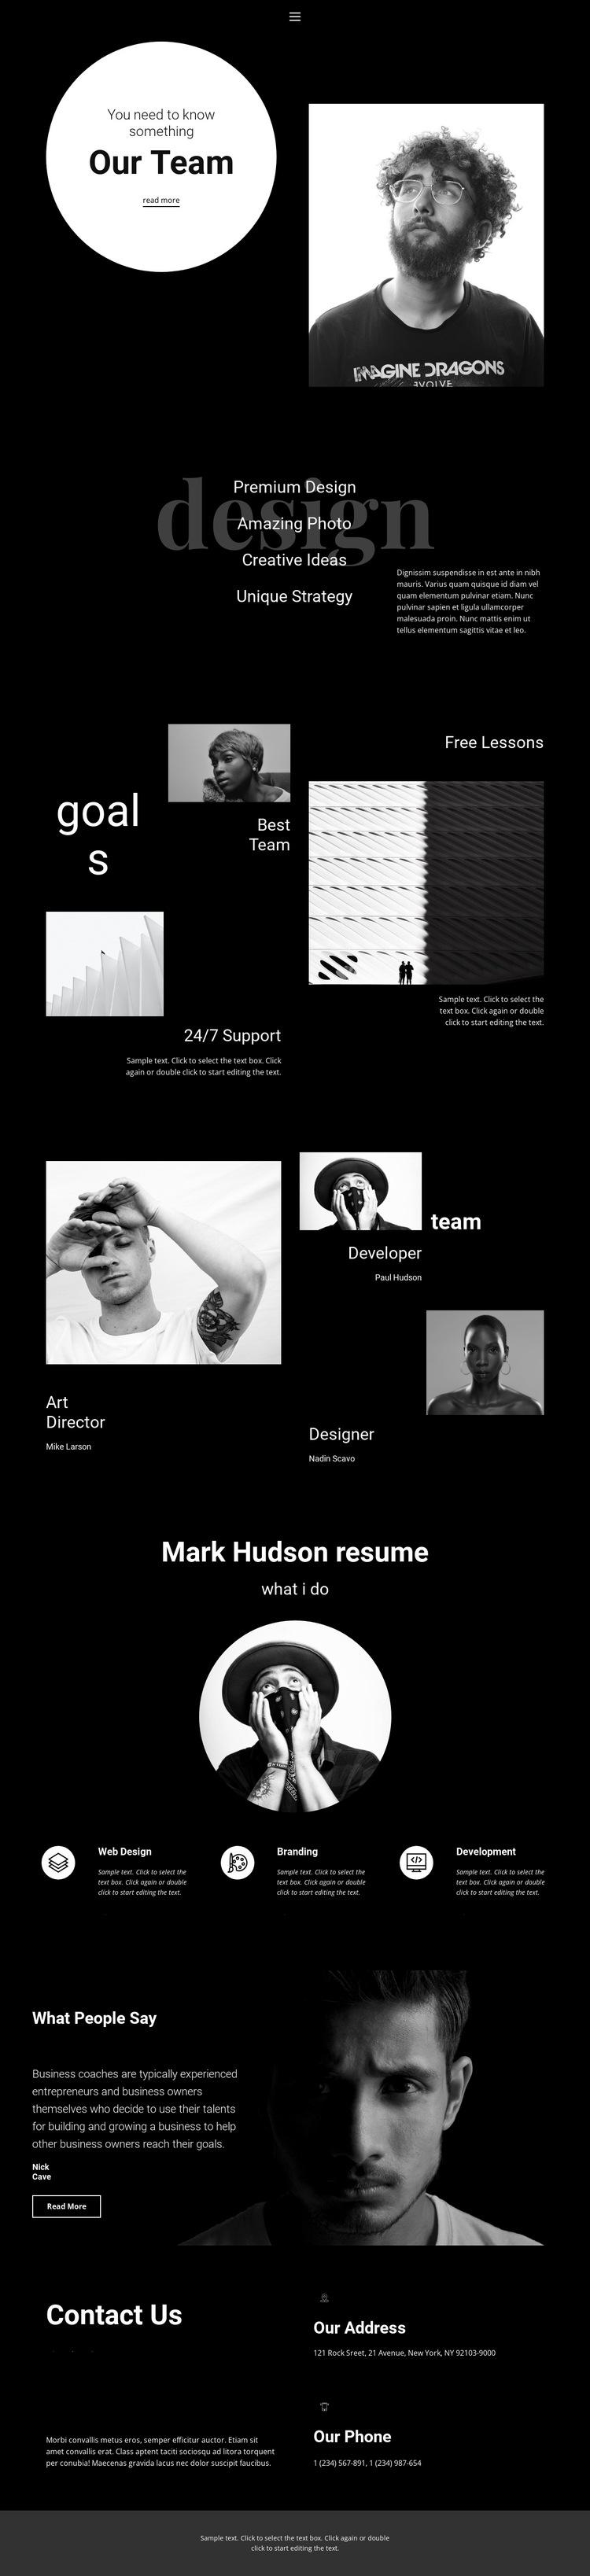 Design and development team HTML5 Template